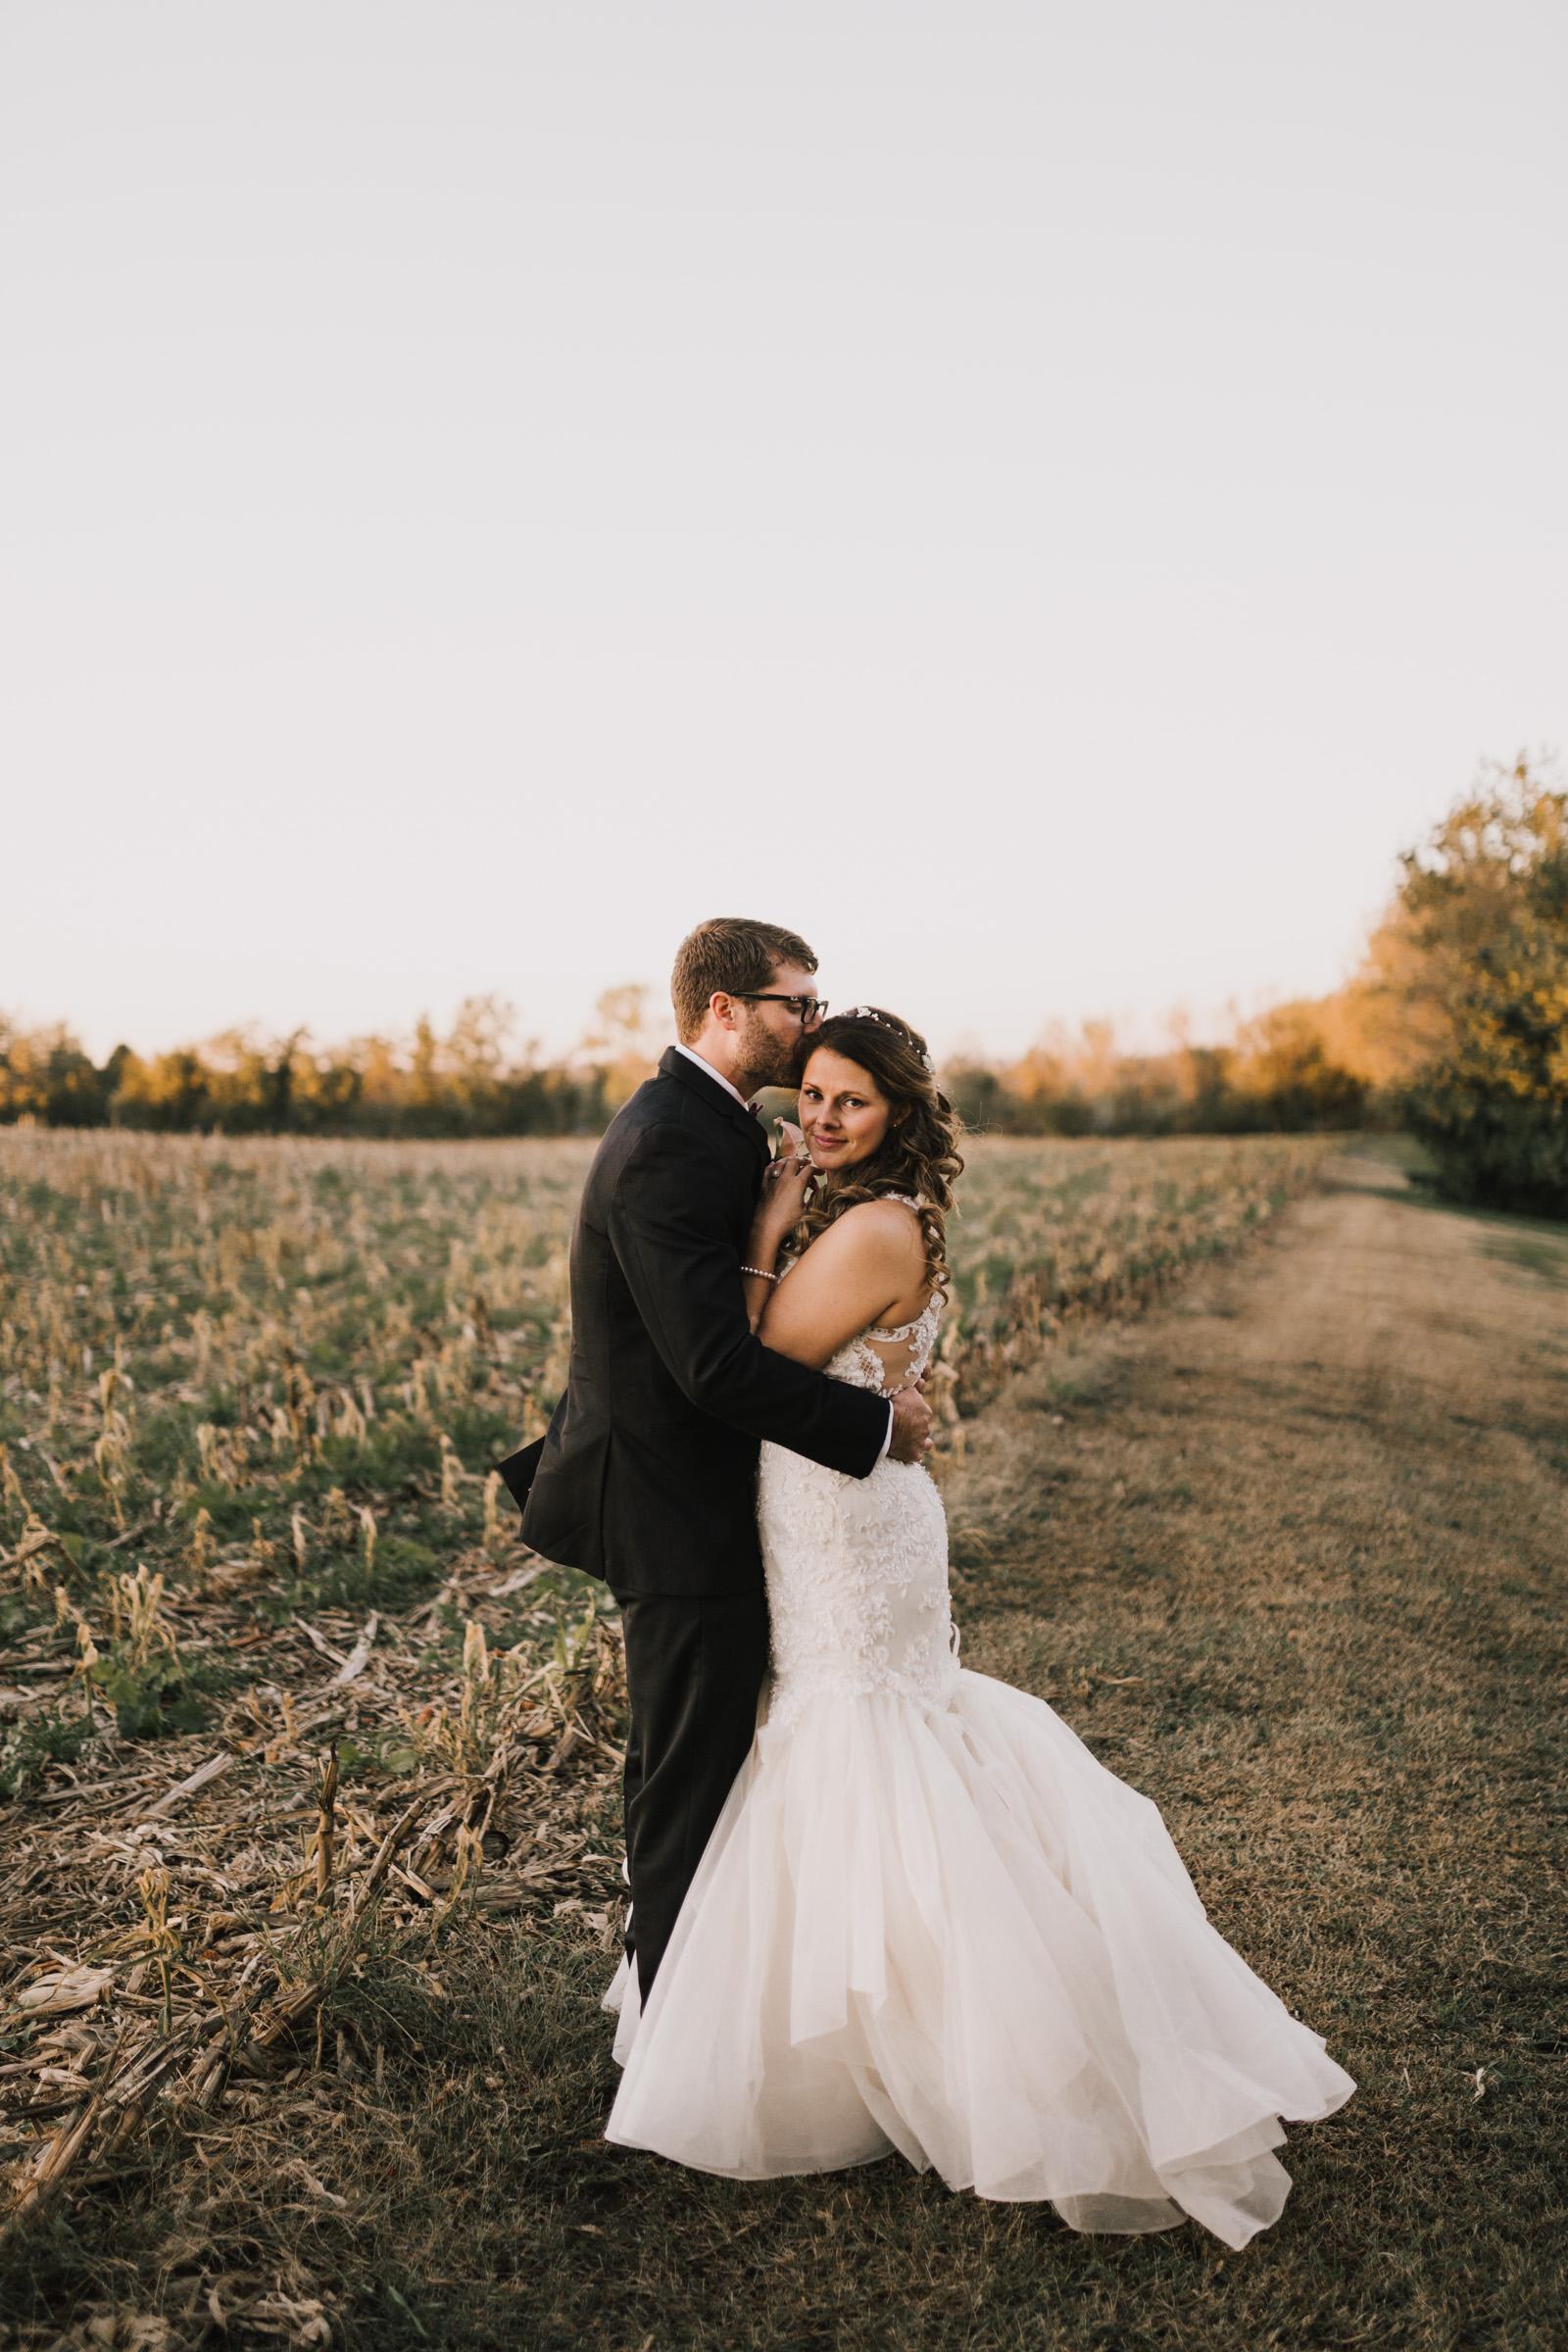 alyssa barletter photography intimate fall autumn wedding rural missouri wedding photographer-39.jpg